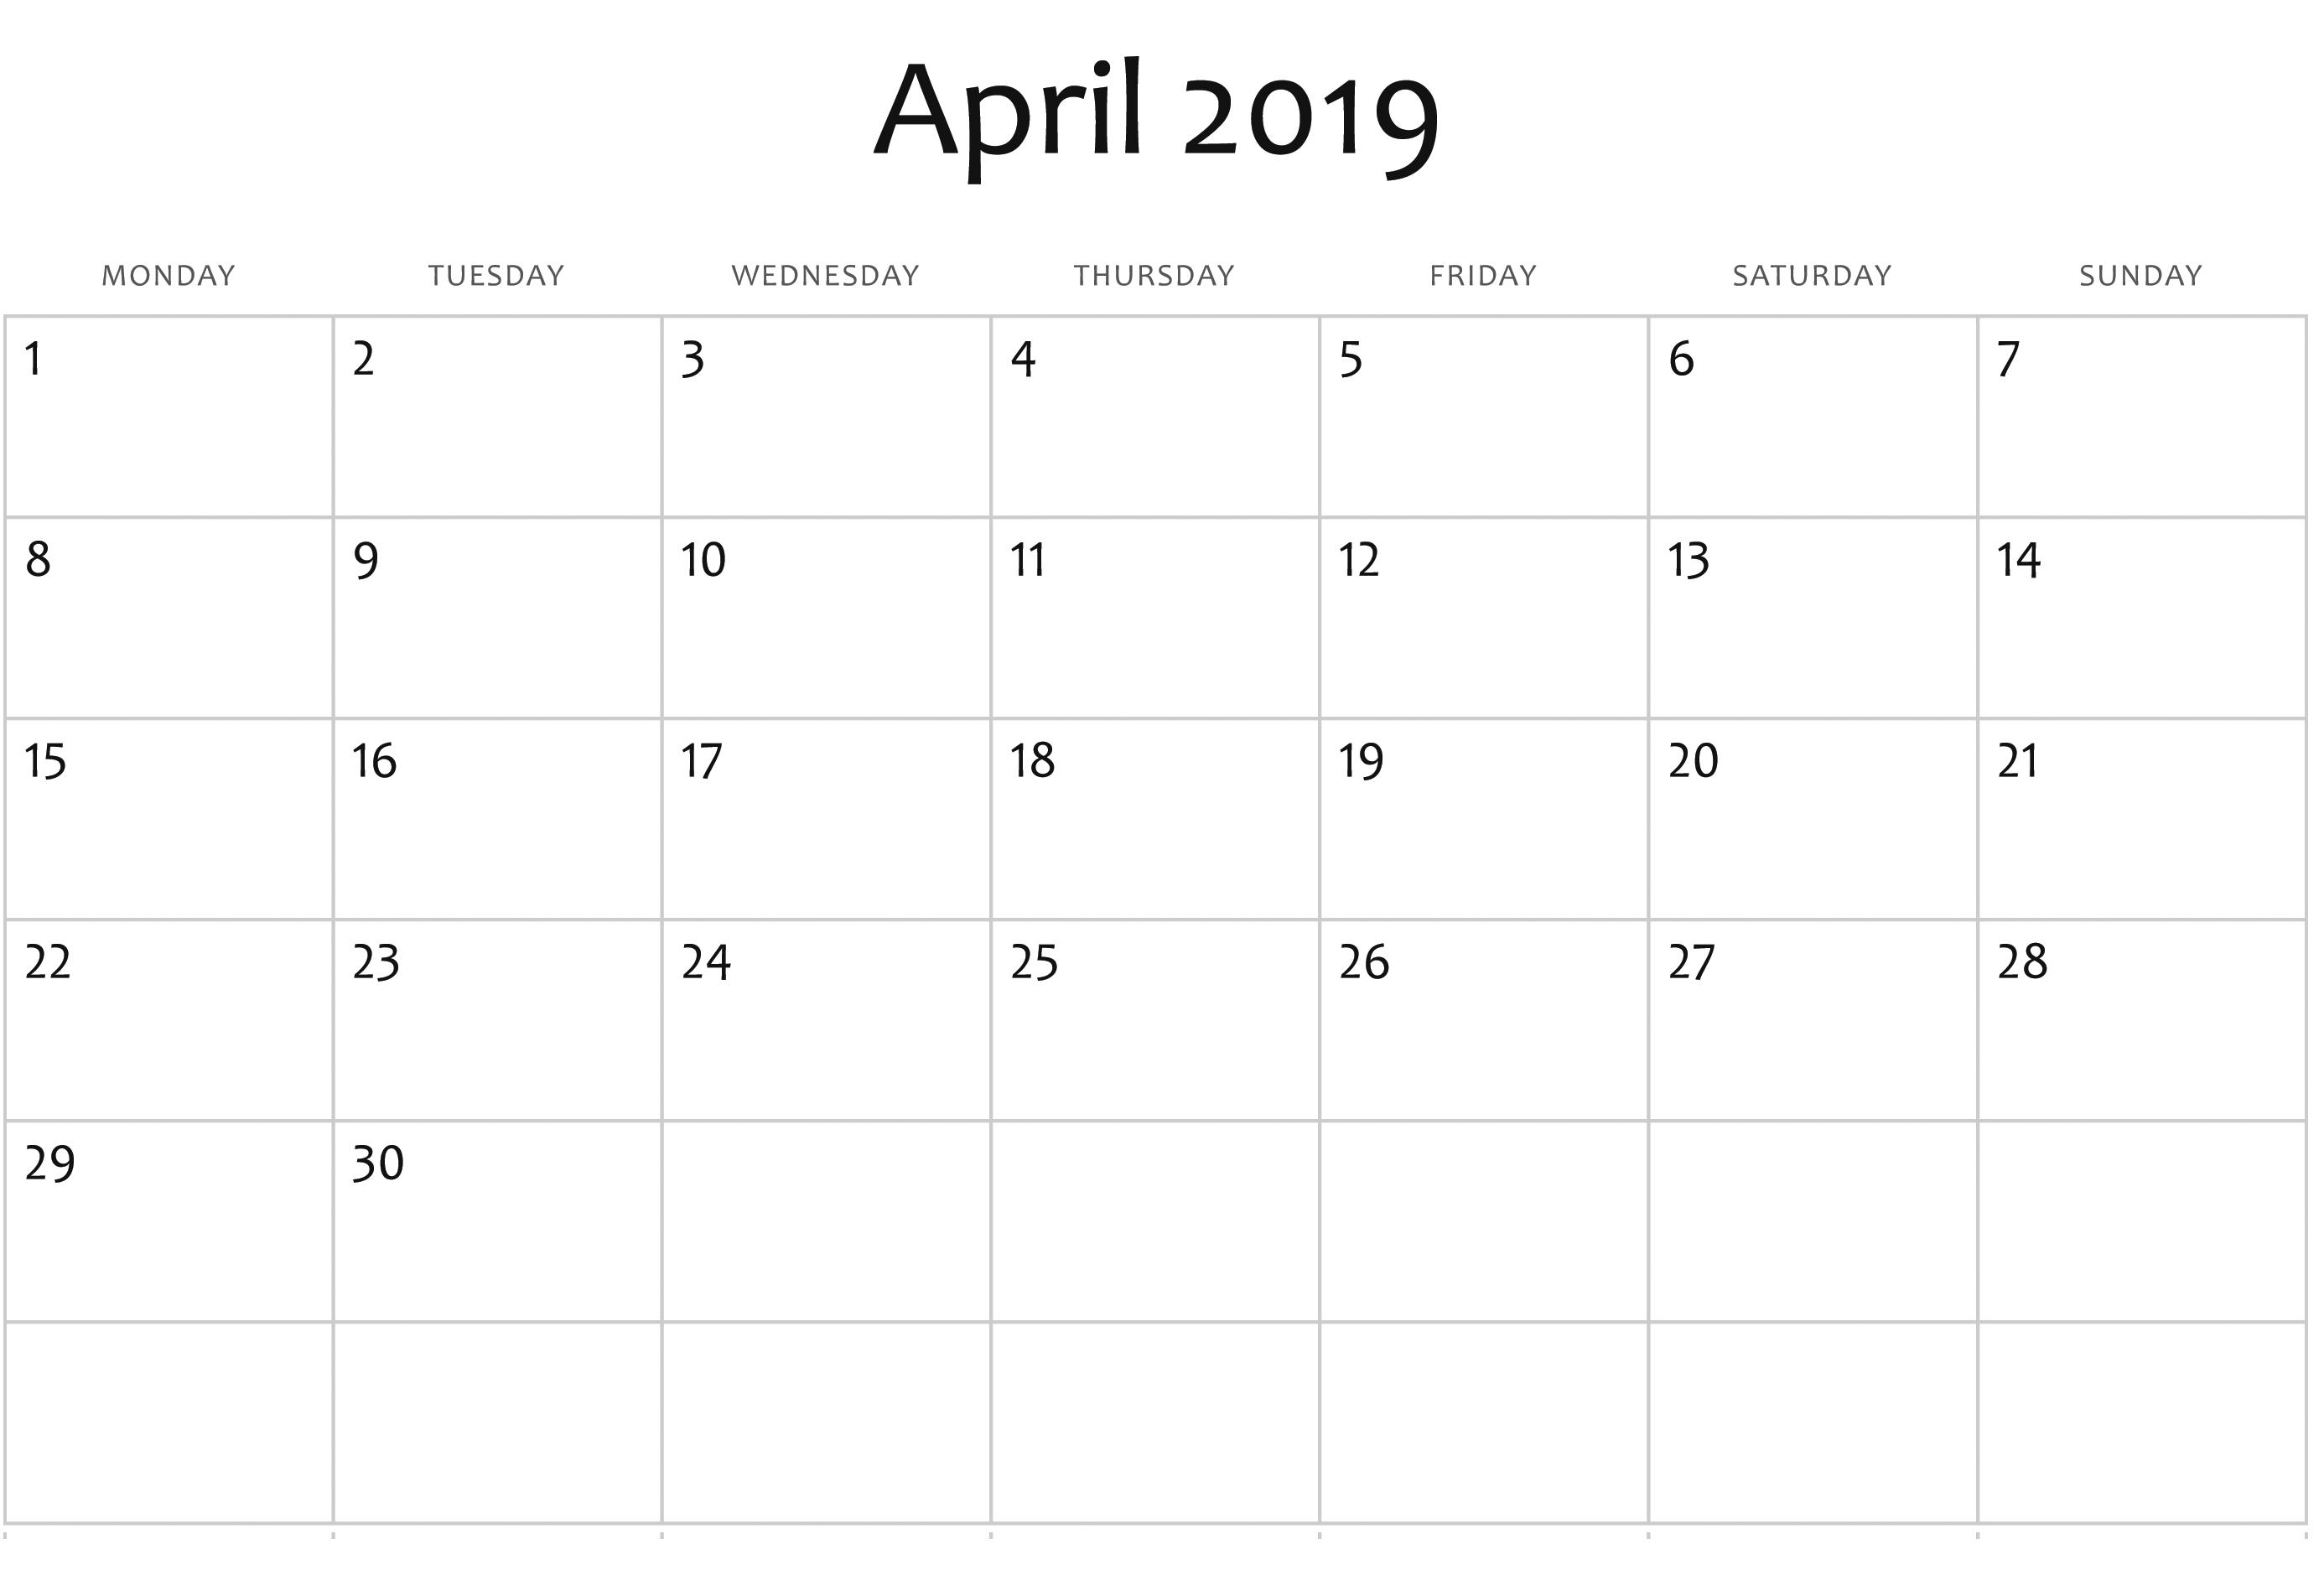 Calendar 2019 Editable Blank April 2019 Editable Calendar Templates | Calendar 2019